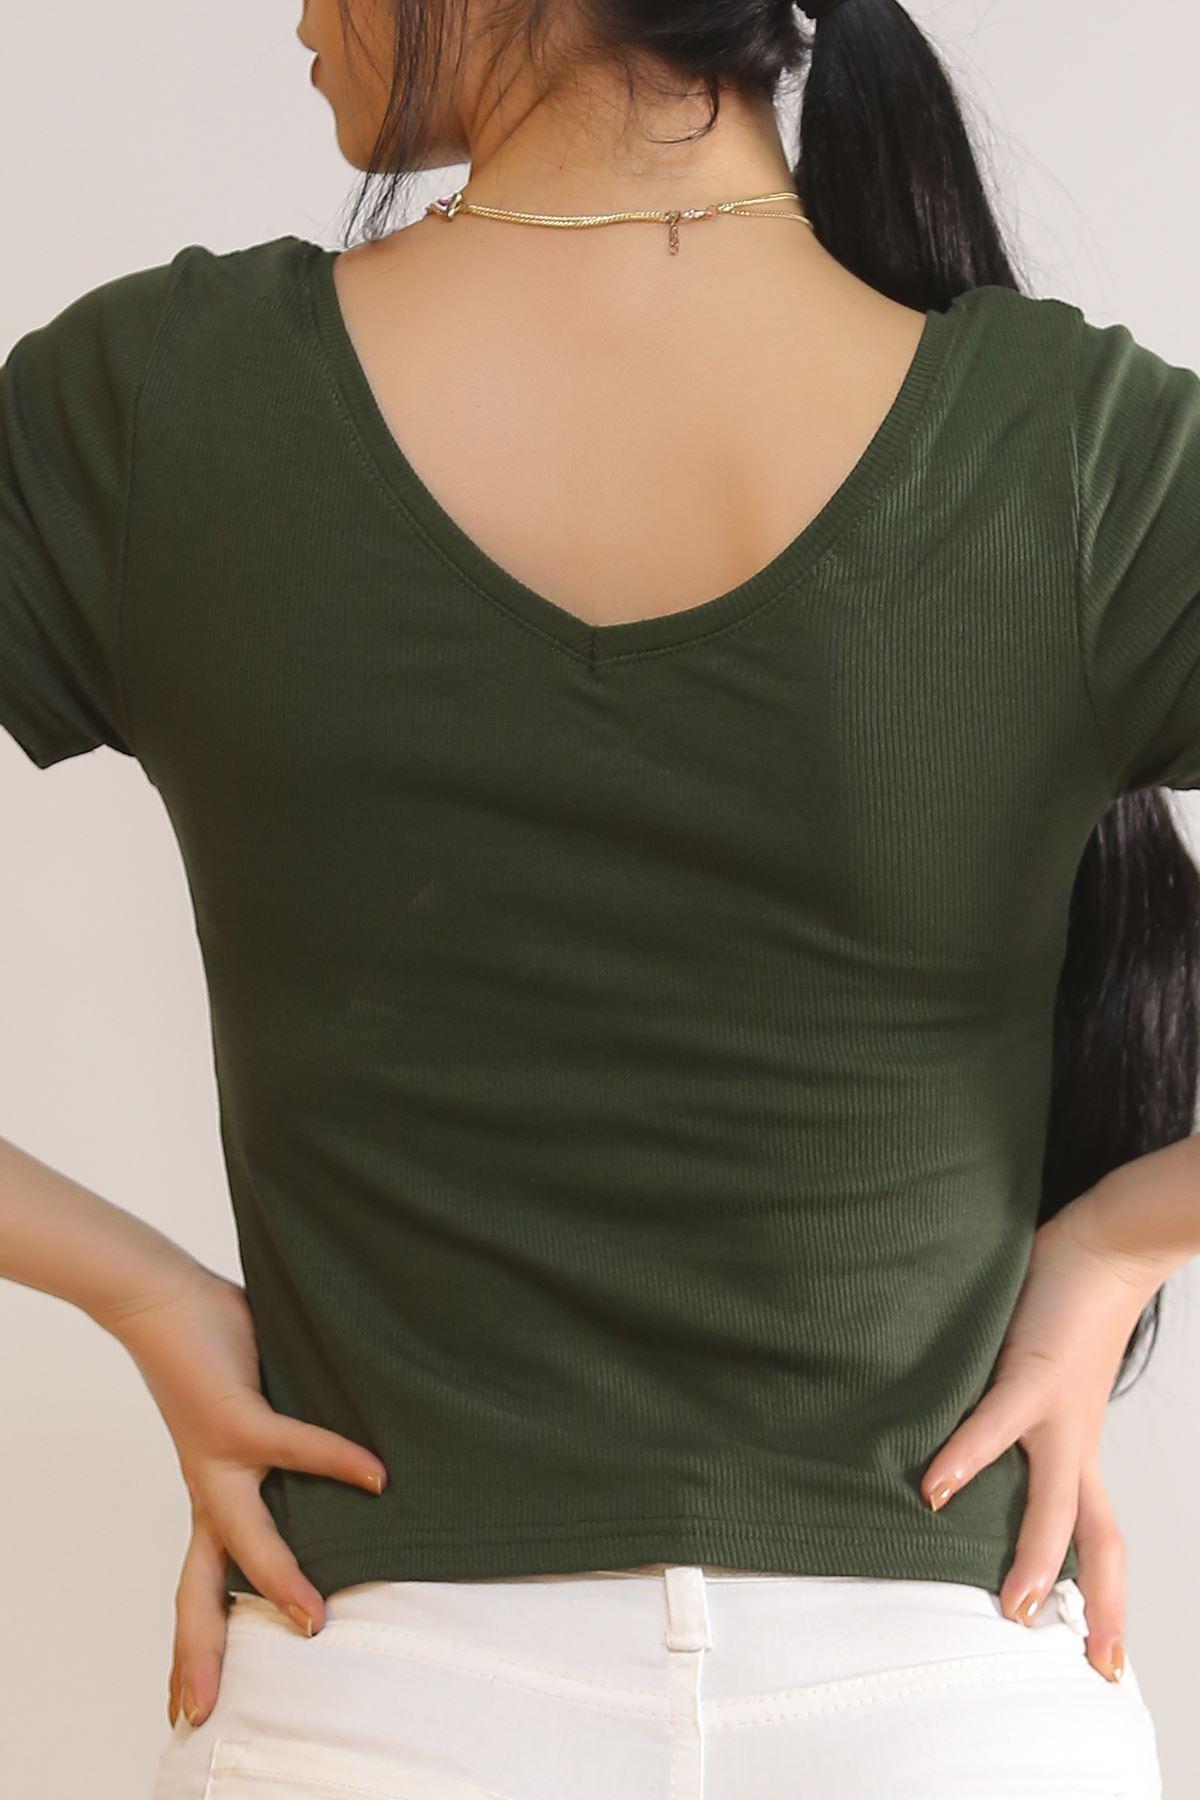 Ön Arka V Yaka Bluz Yeşil - 5311.1092.